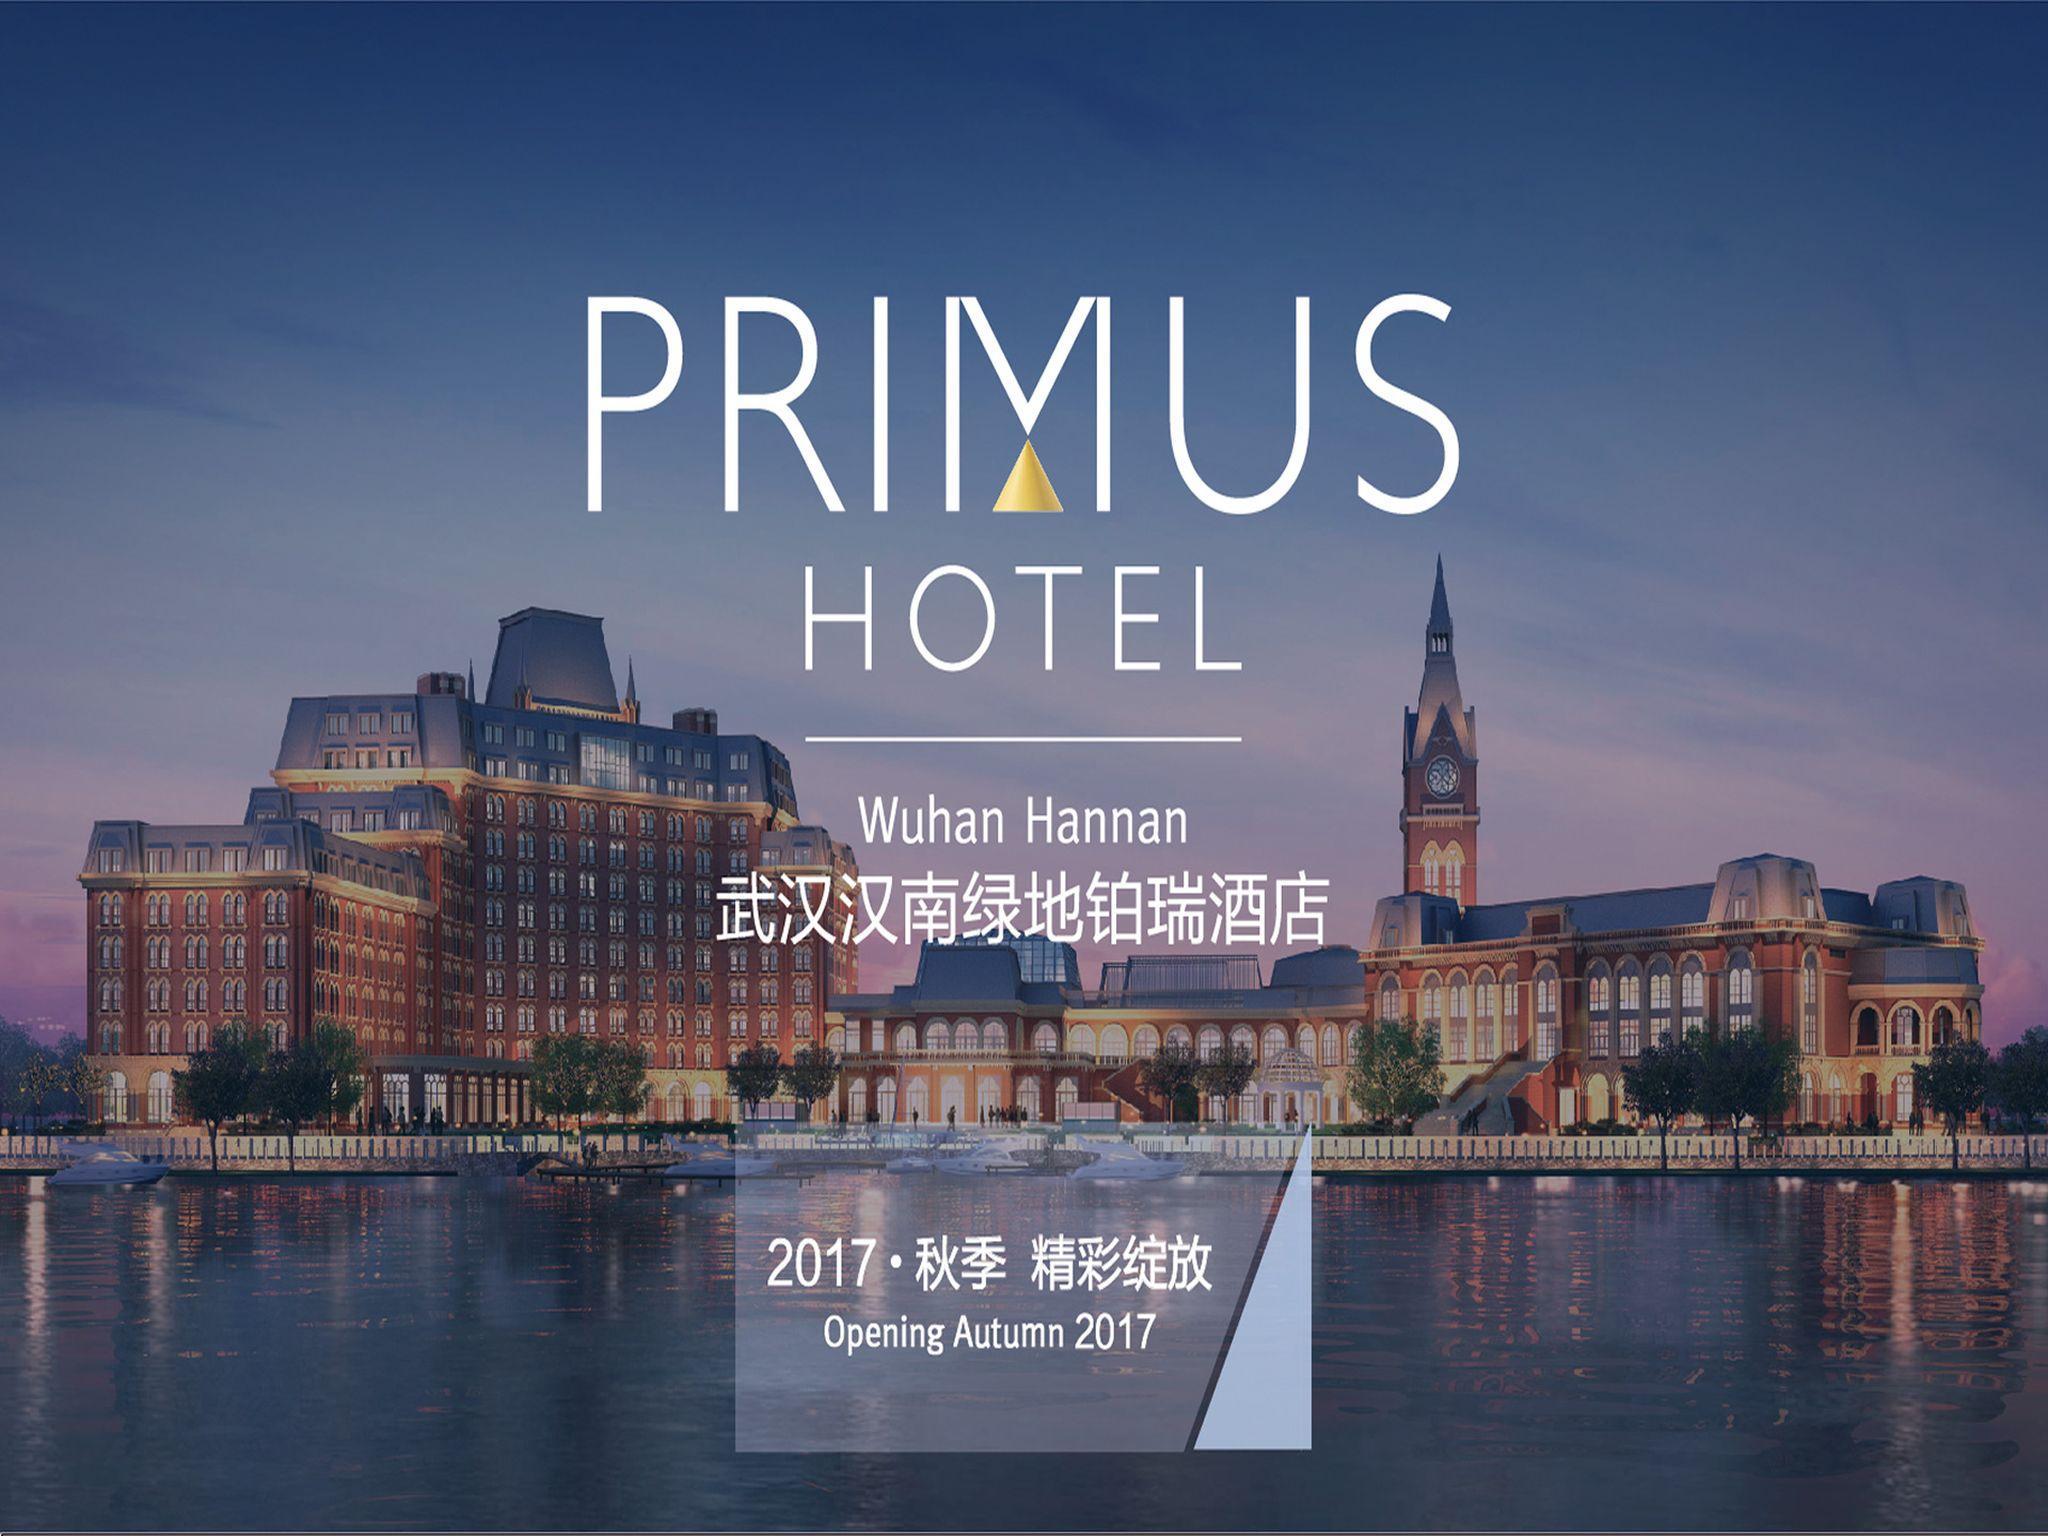 PRIMUS Hotel Wuhan Hannan